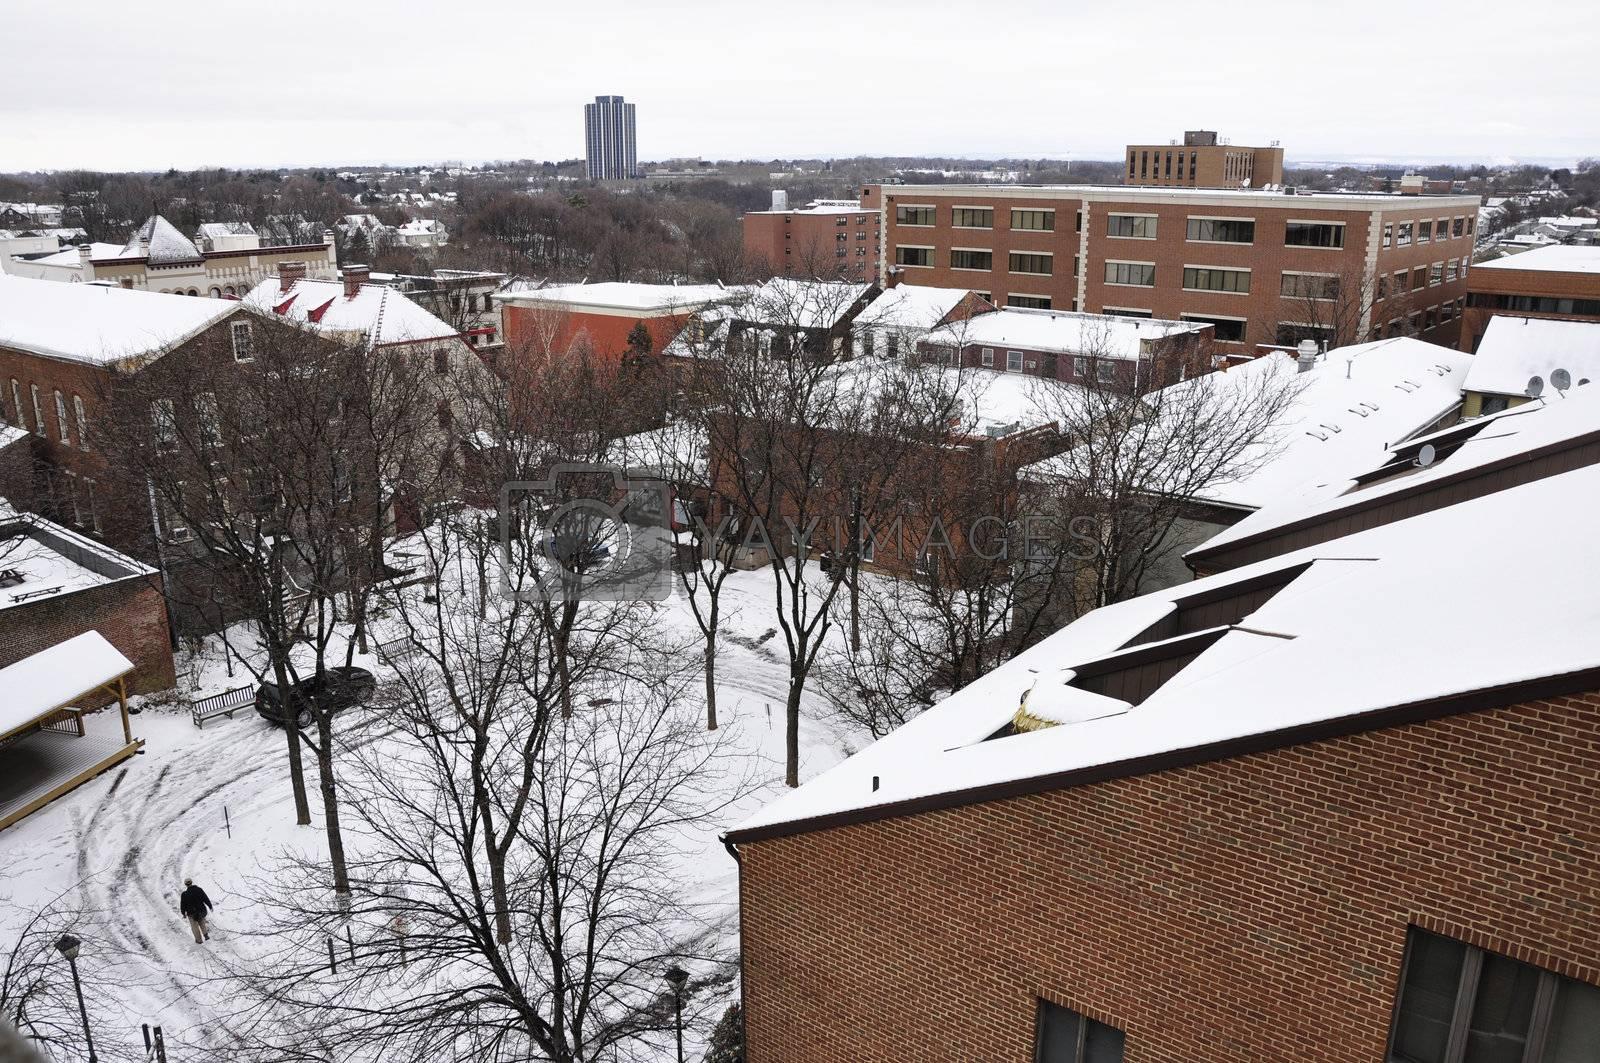 snow covered rooftops in Bethlehem, Pennsylvania